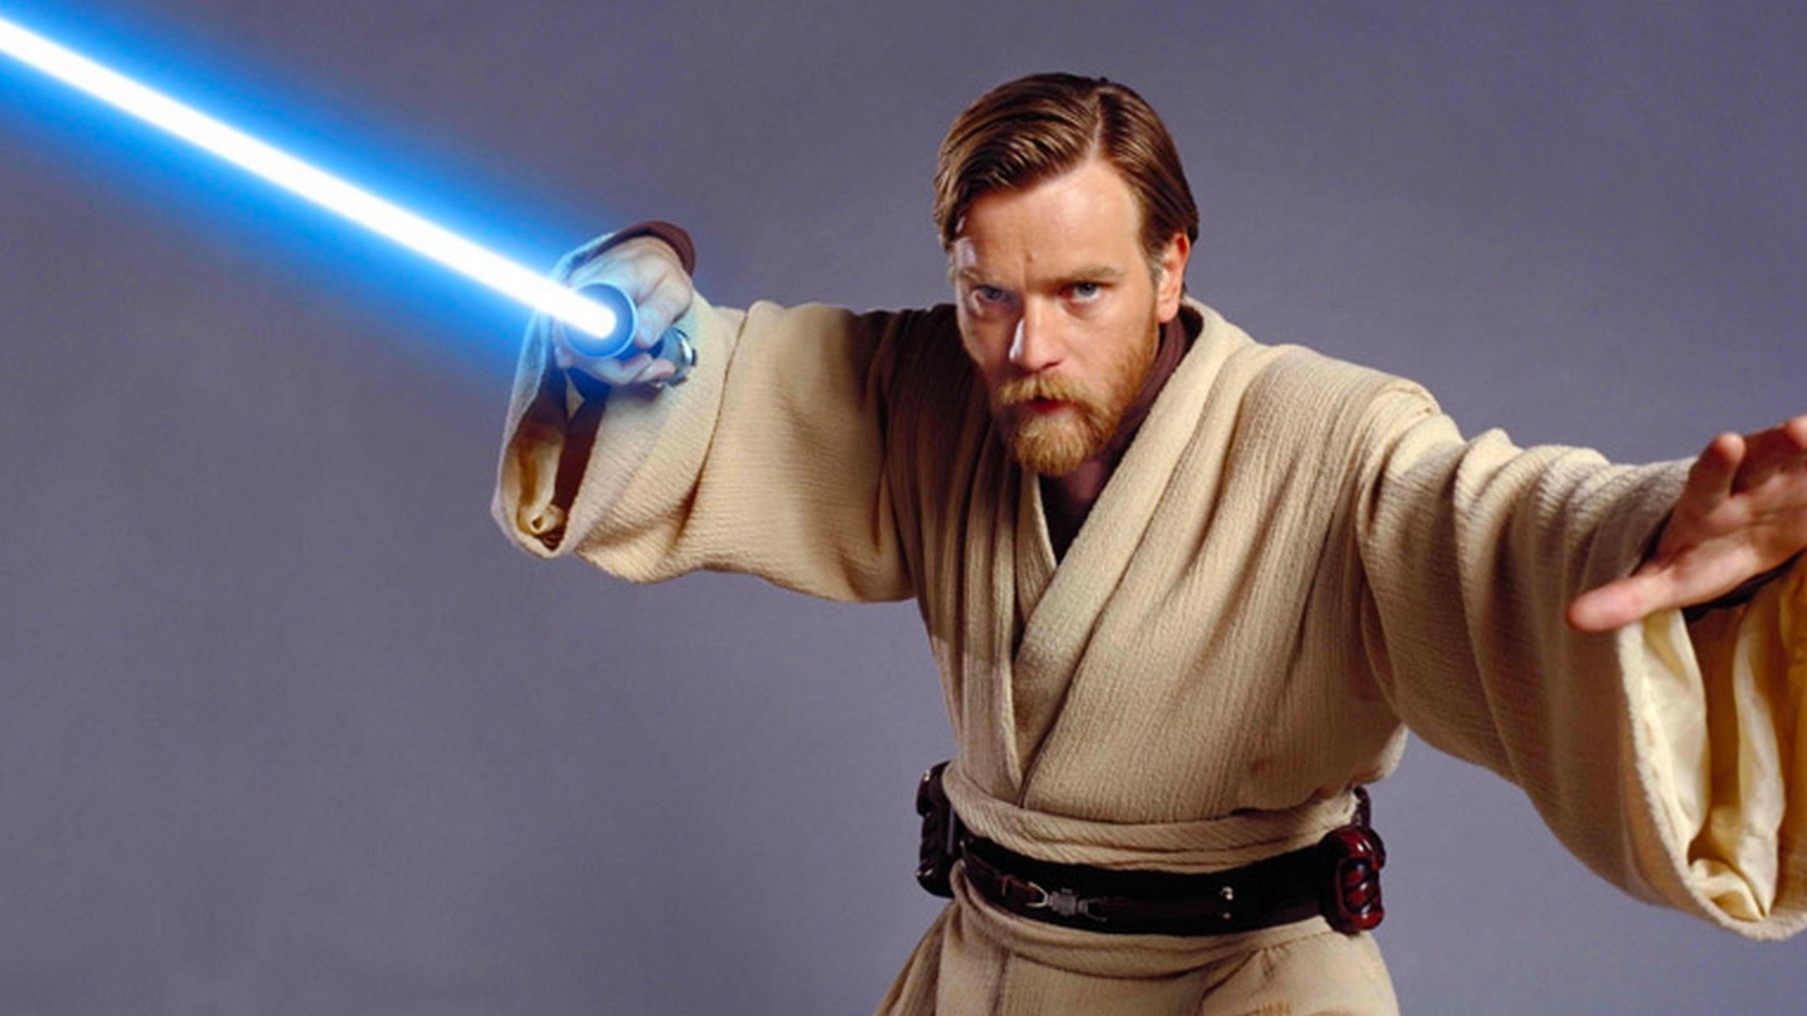 Юэн МакГрегор готов вернуться к роли Оби-Вана